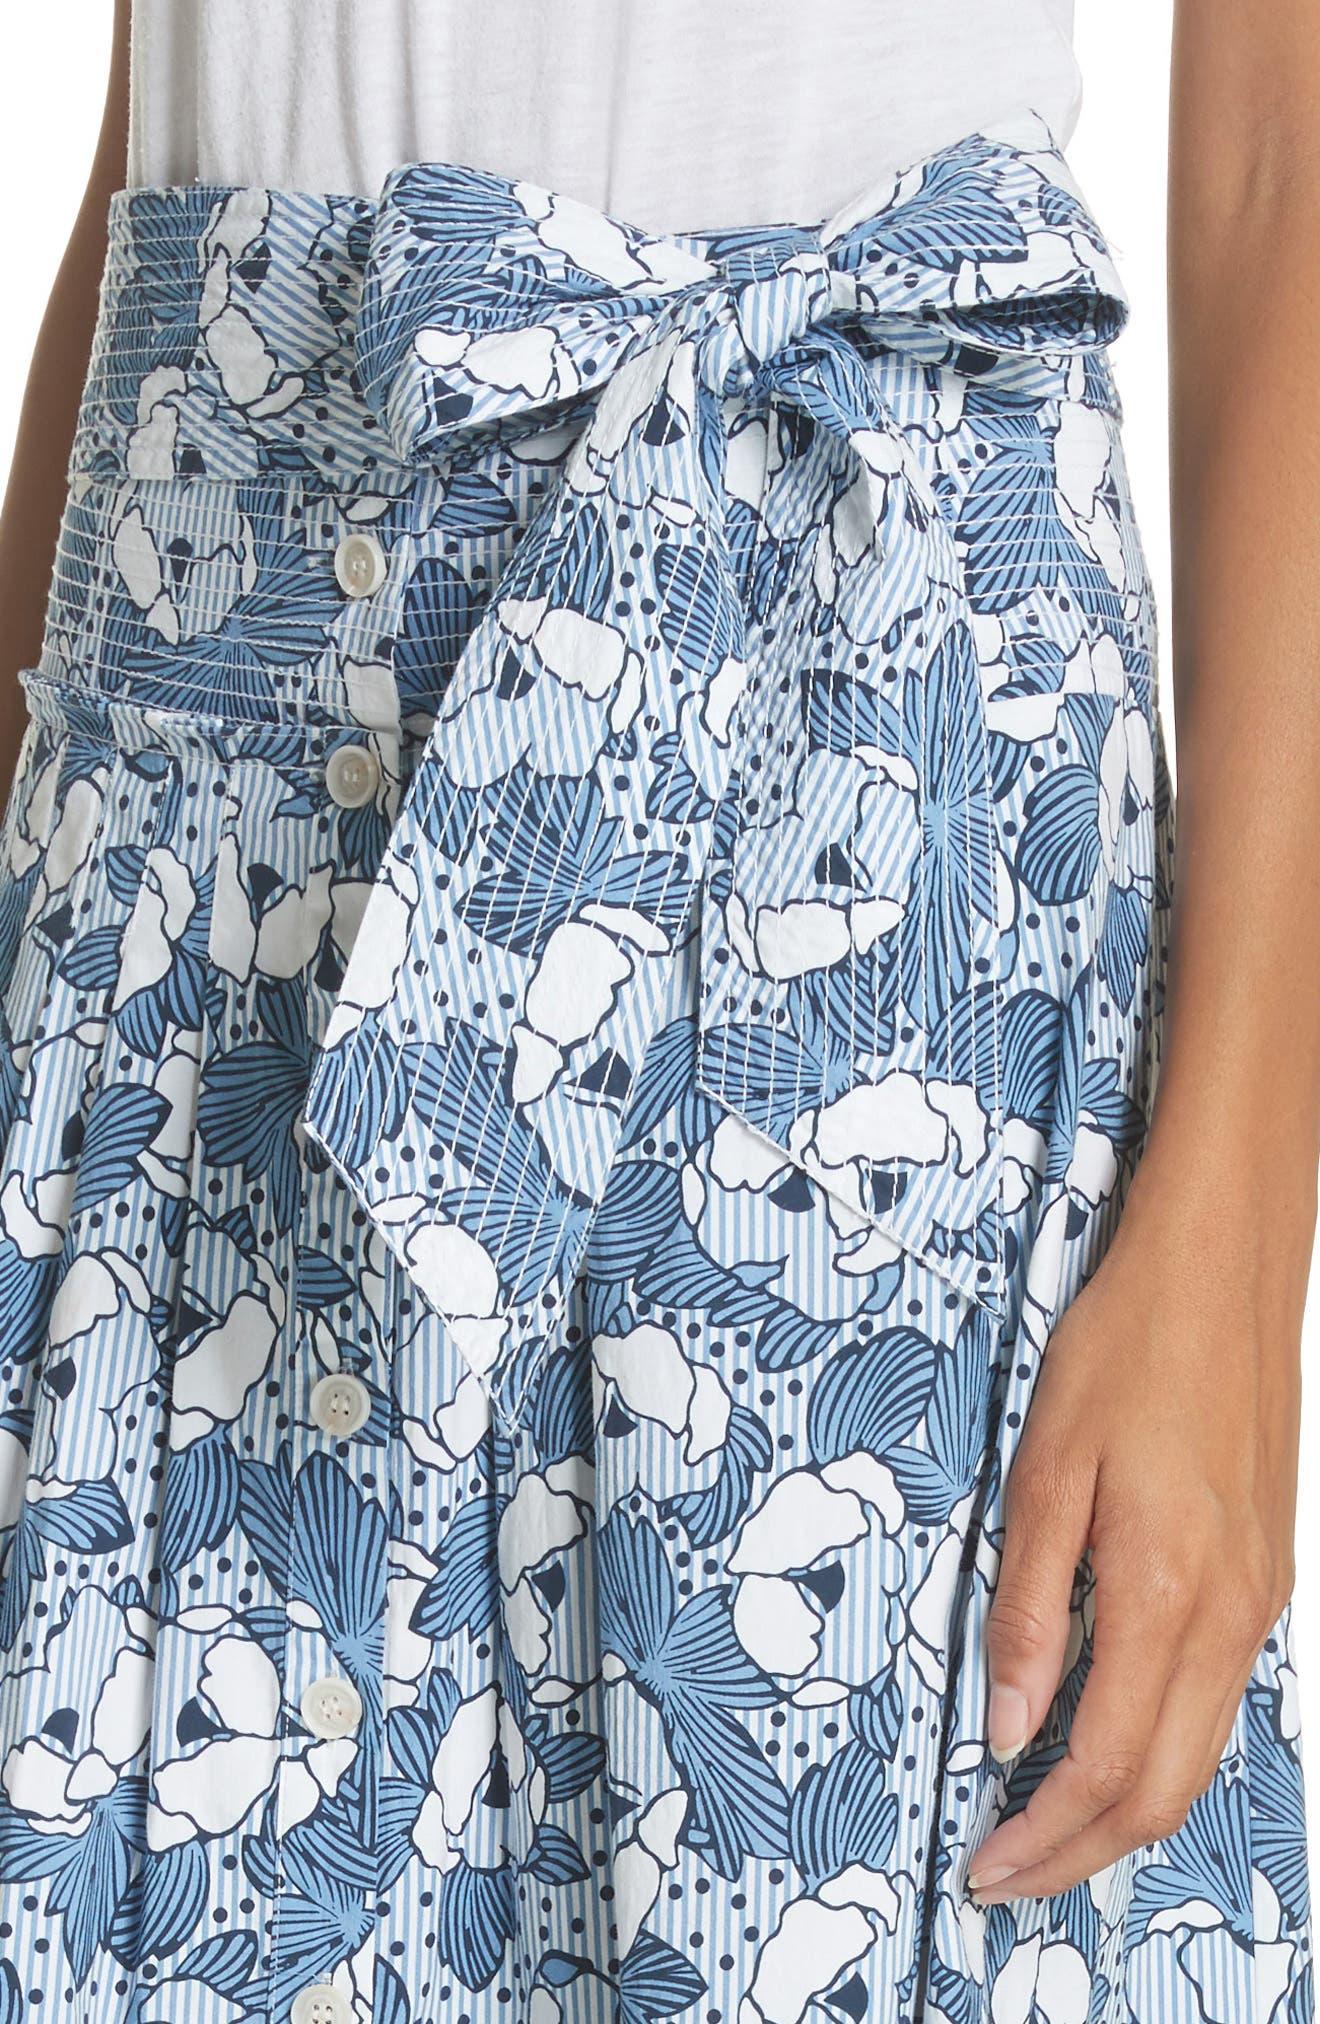 Caralina Floral Print Midi Skirt,                             Alternate thumbnail 4, color,                             Blue/ White